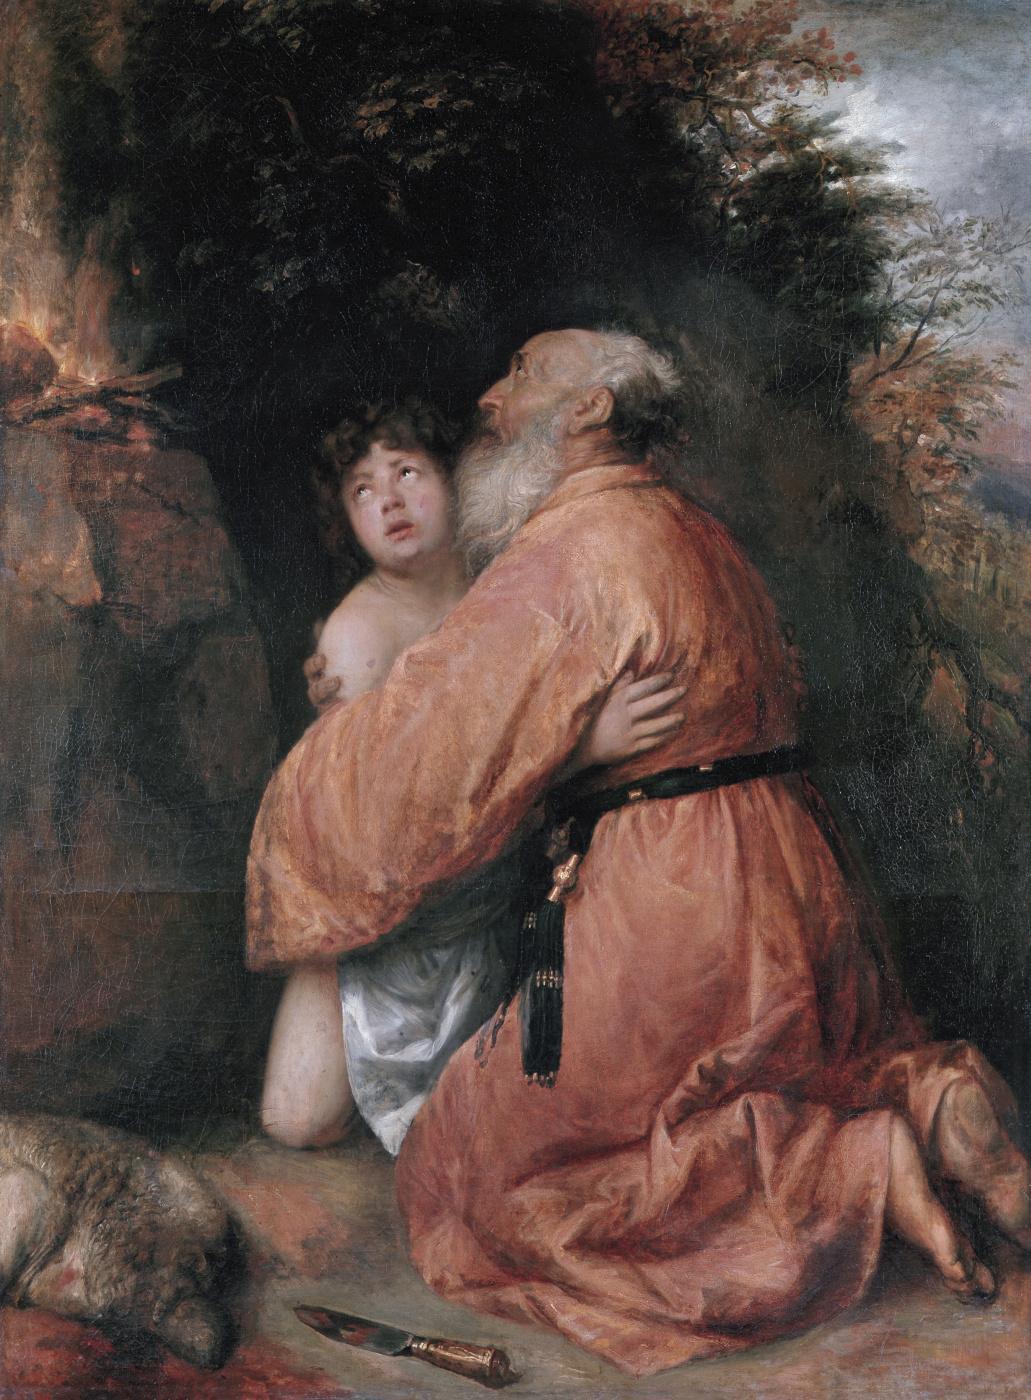 Jan Lievens. Abraham sacrifices a lamb instead of Isaac